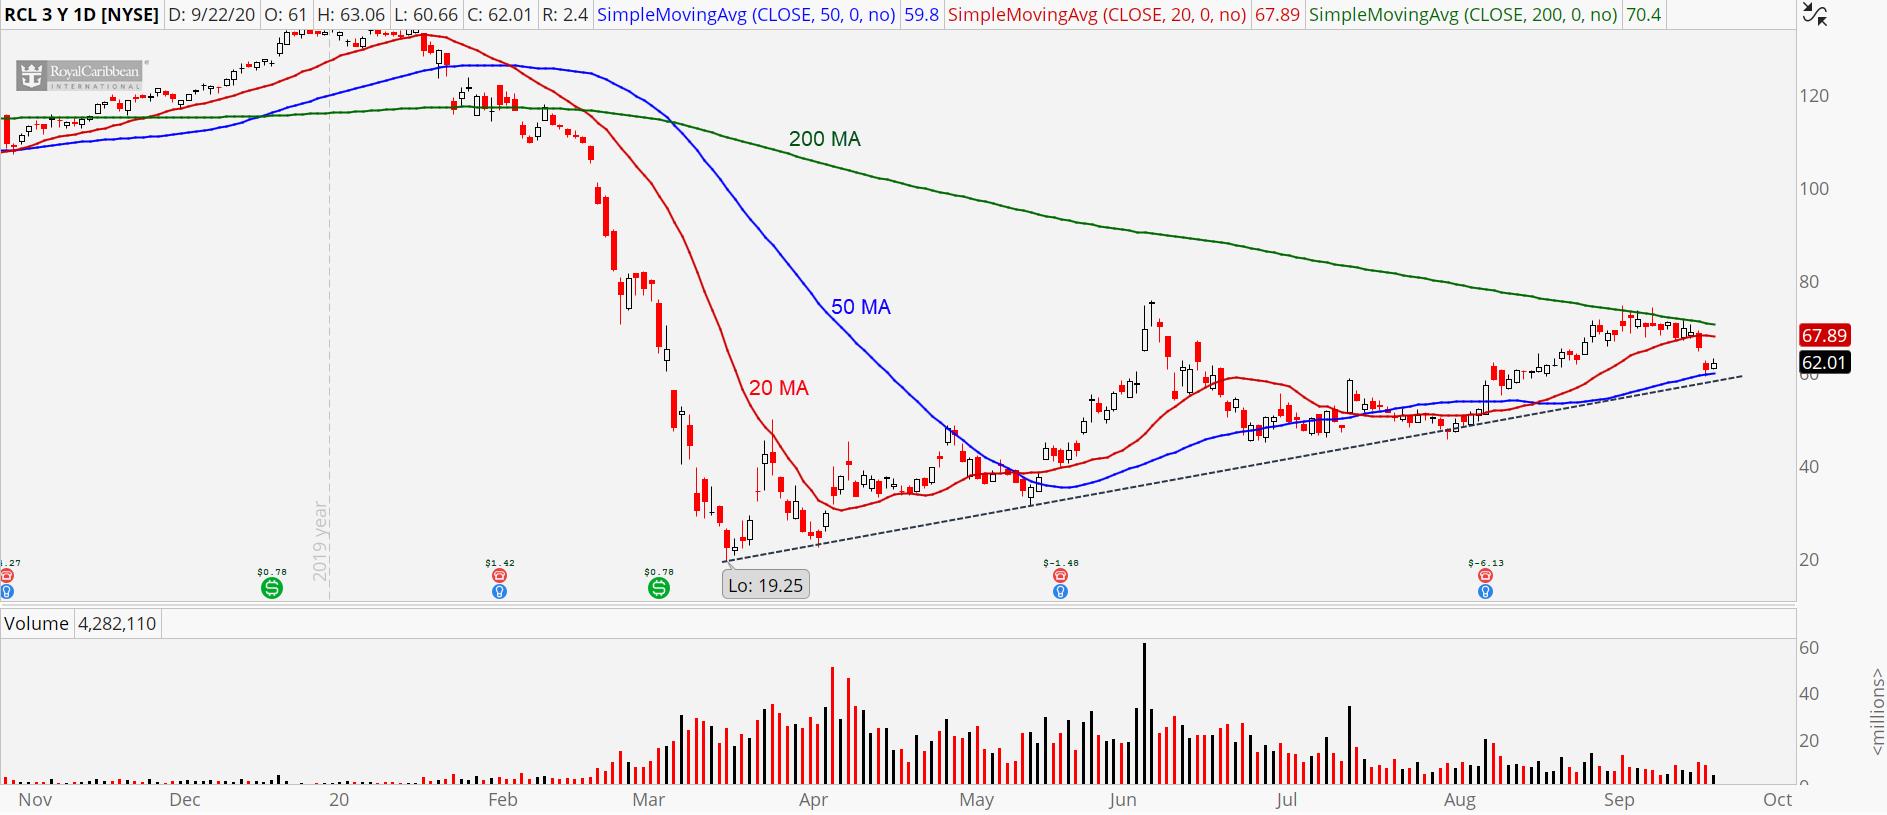 Royal Caribbean (RCL) stock chart showingkey moving averages